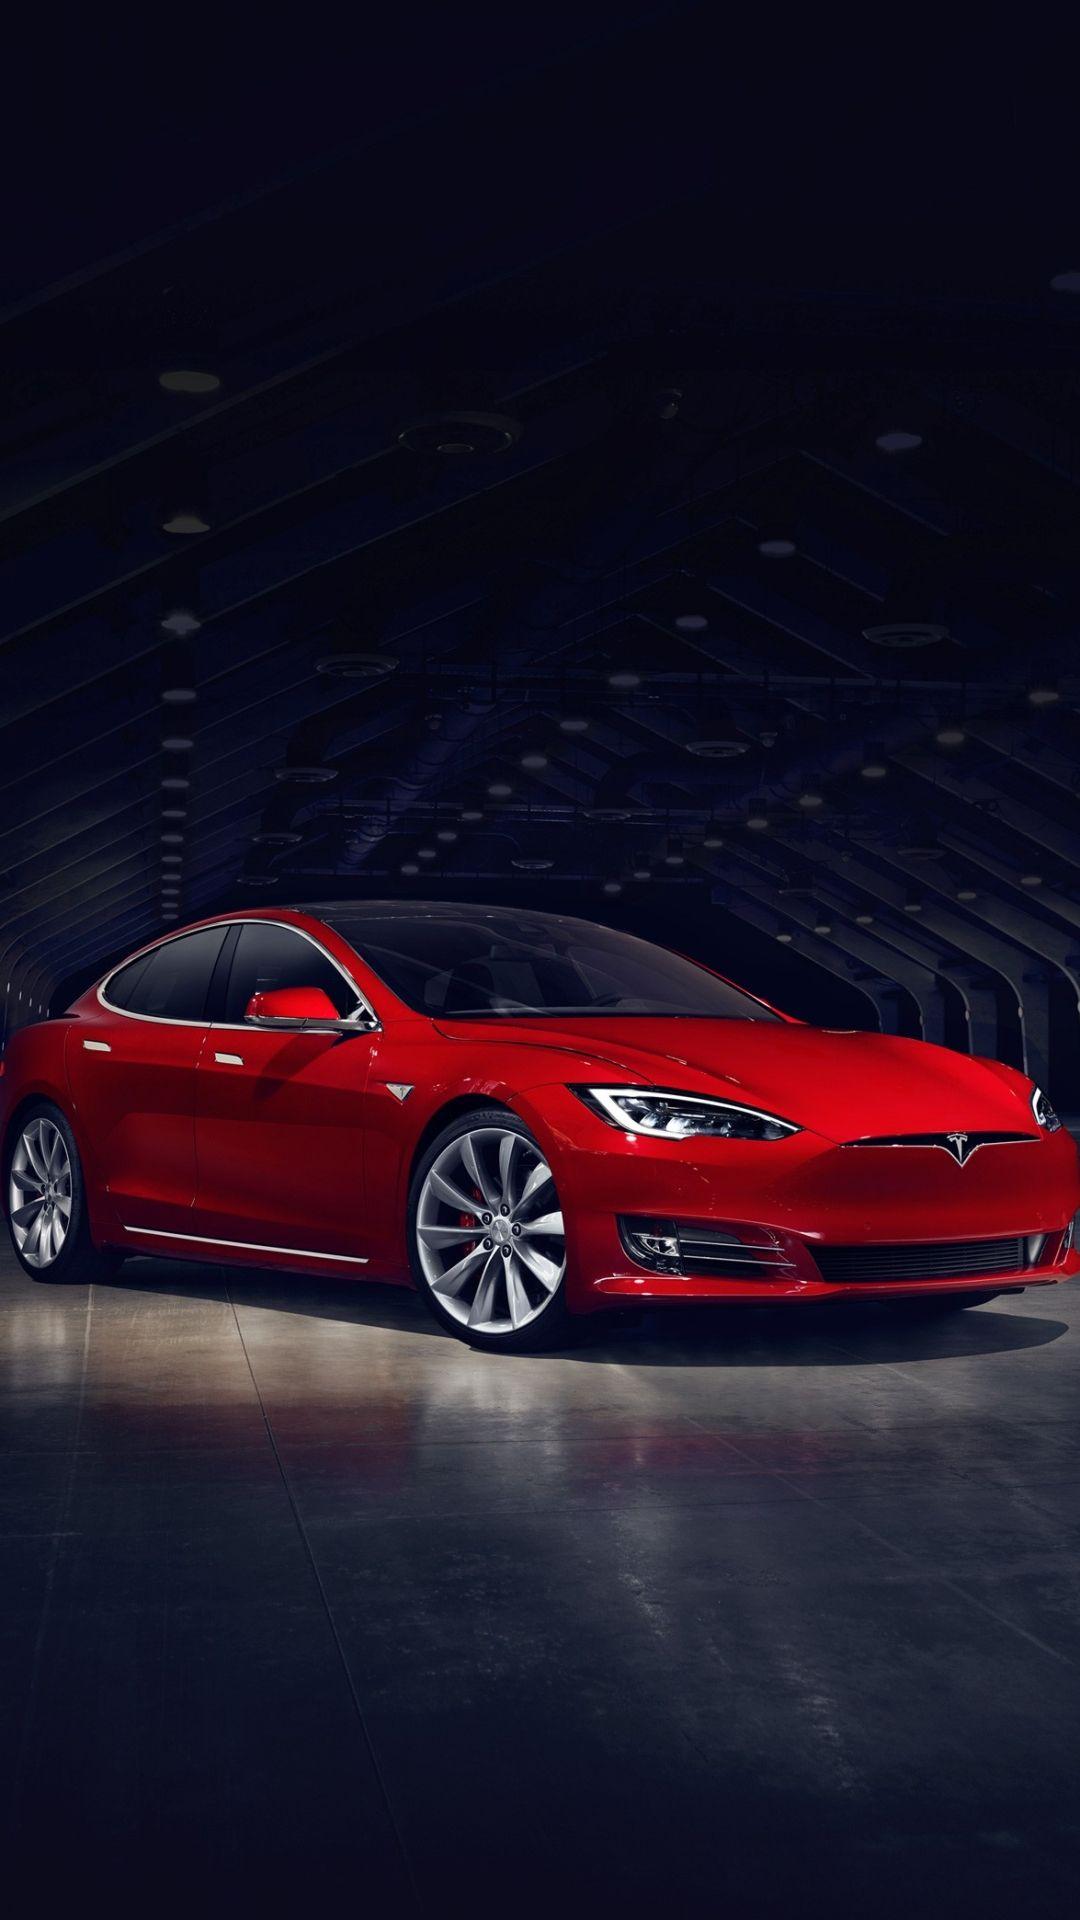 CyberTruck wallpaper (With images) Tesla